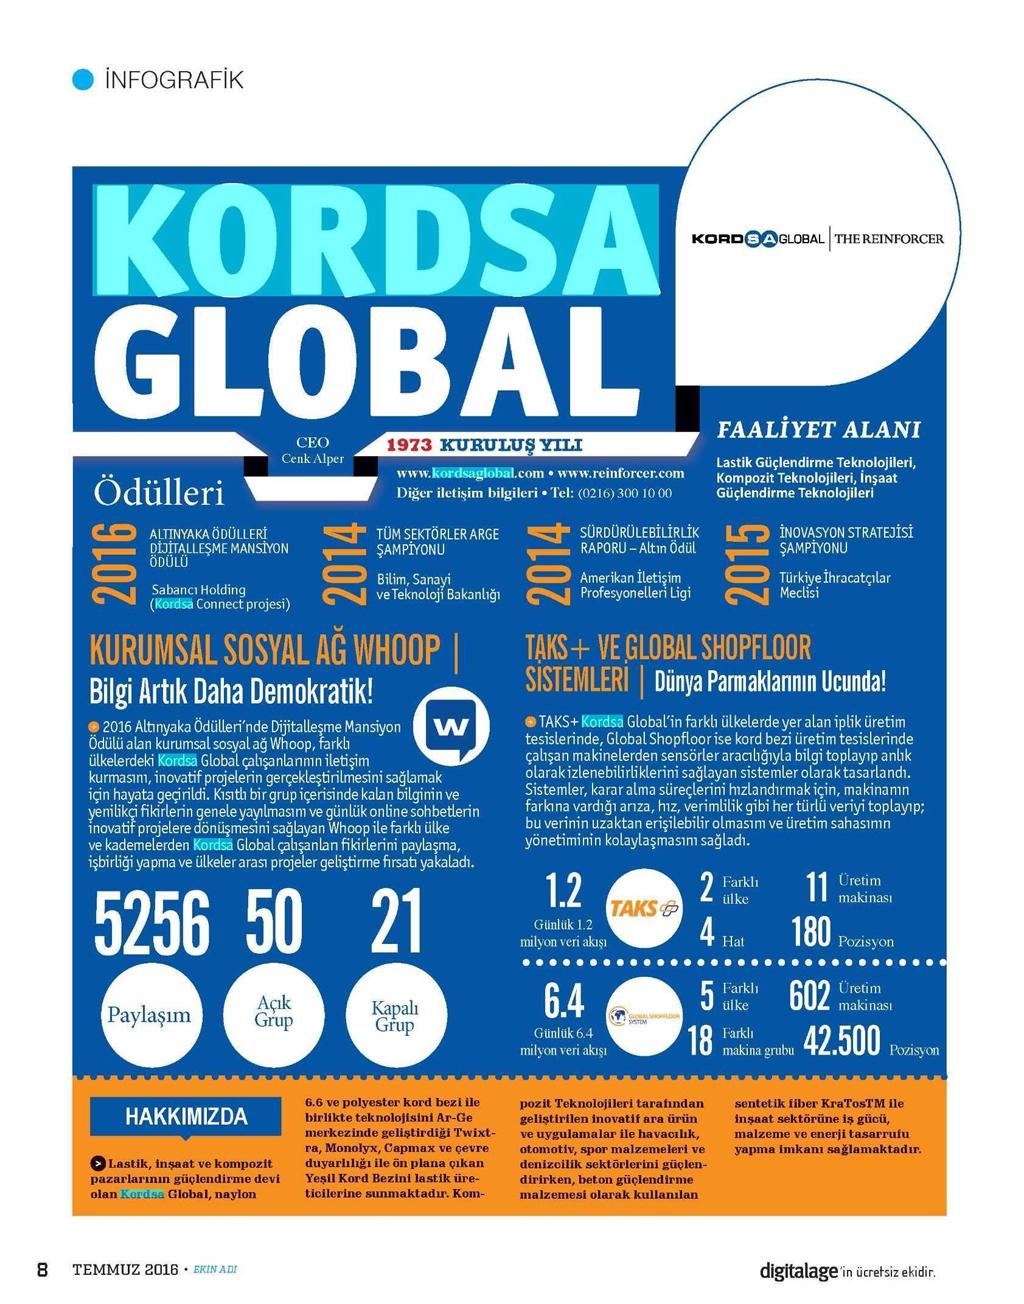 Kordsa Global Digital Age Infographic